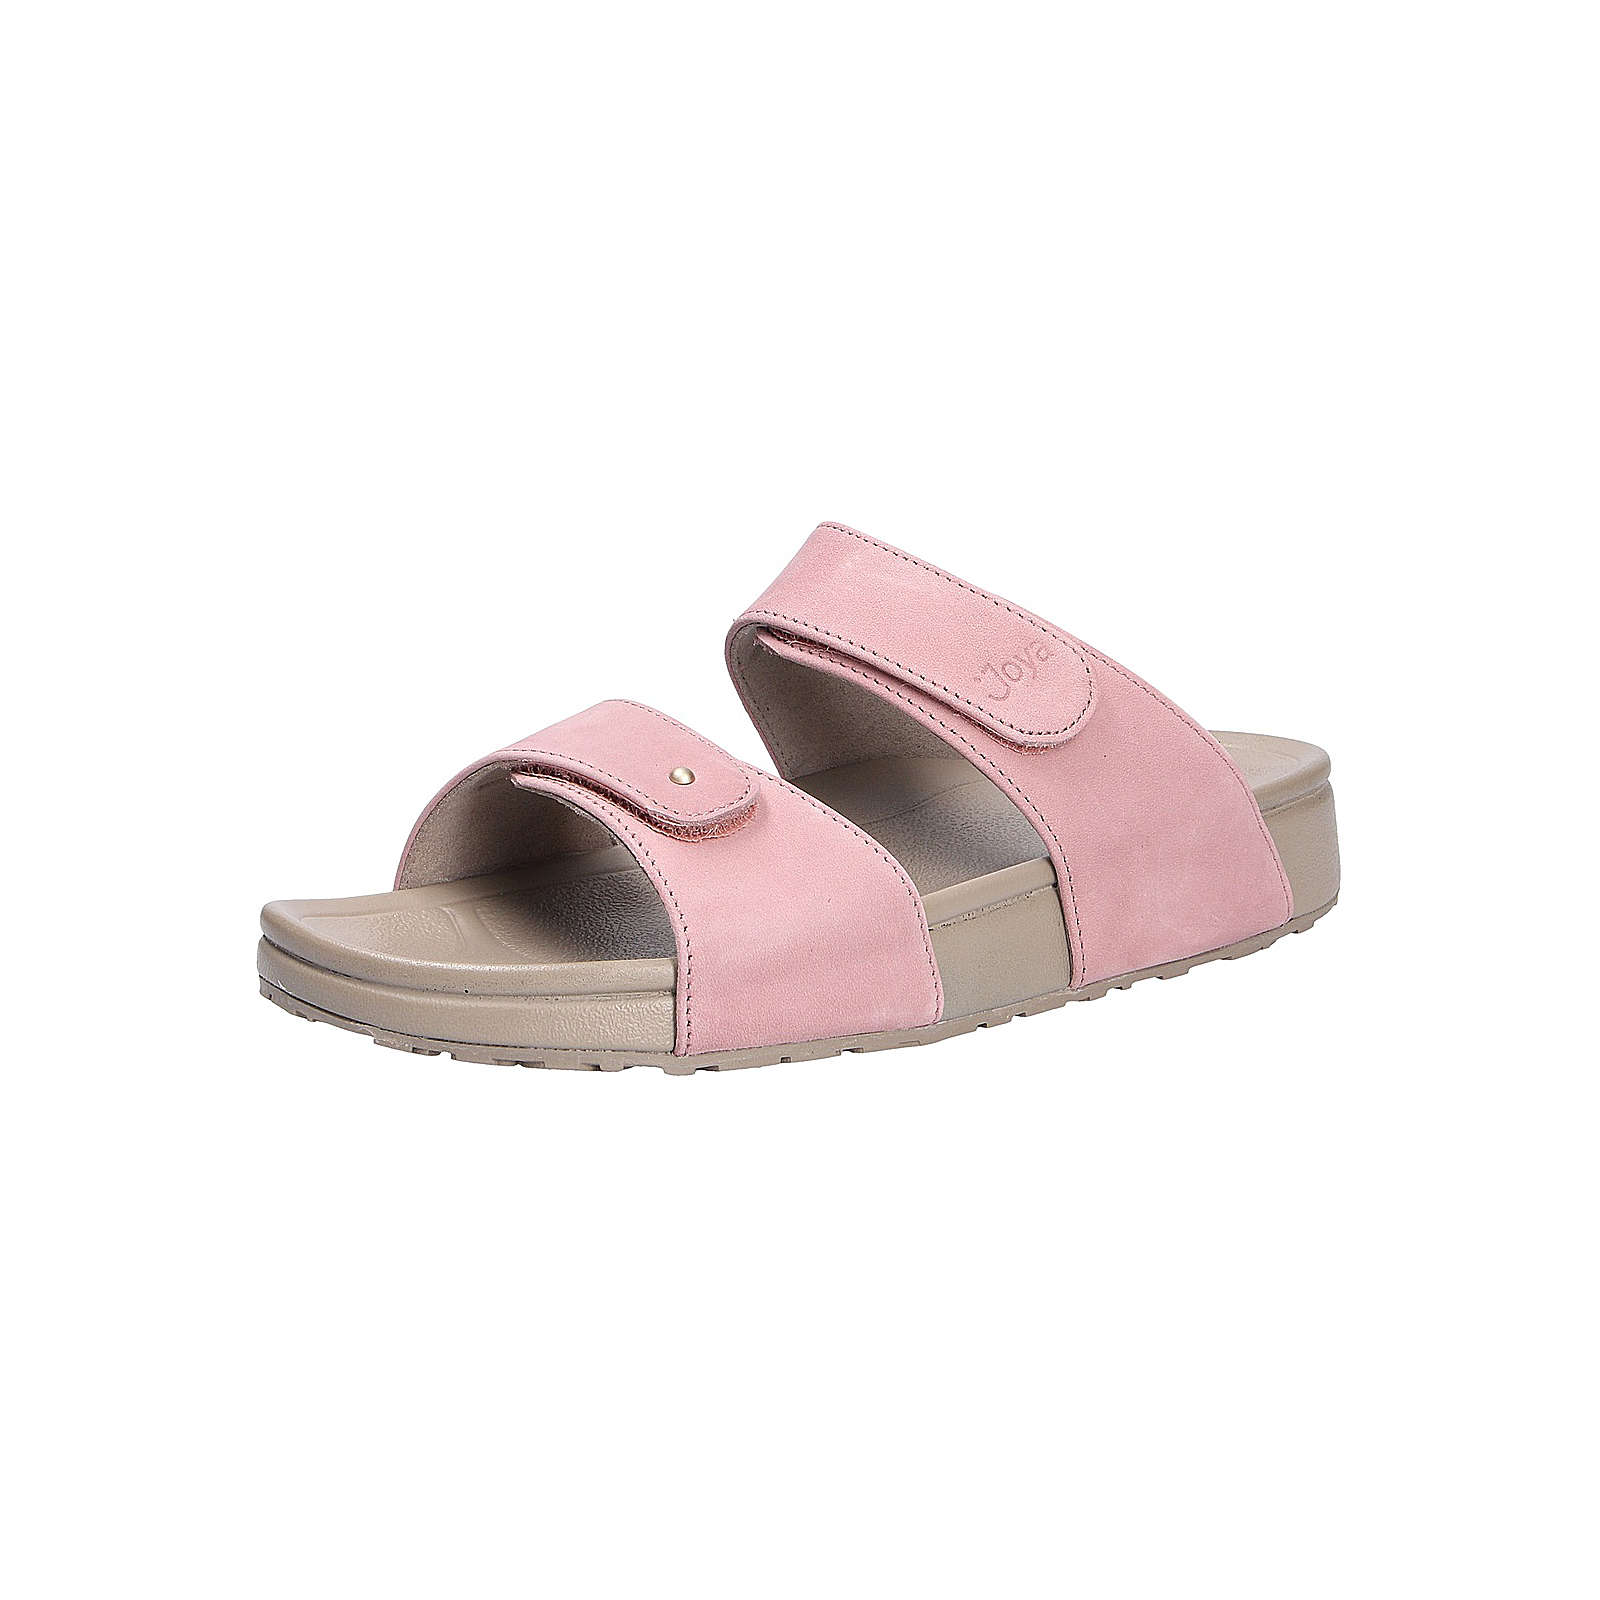 Joya Comfort Pantolette VIENNA PINK Komfort-Pantoletten rosa Damen Gr. 36